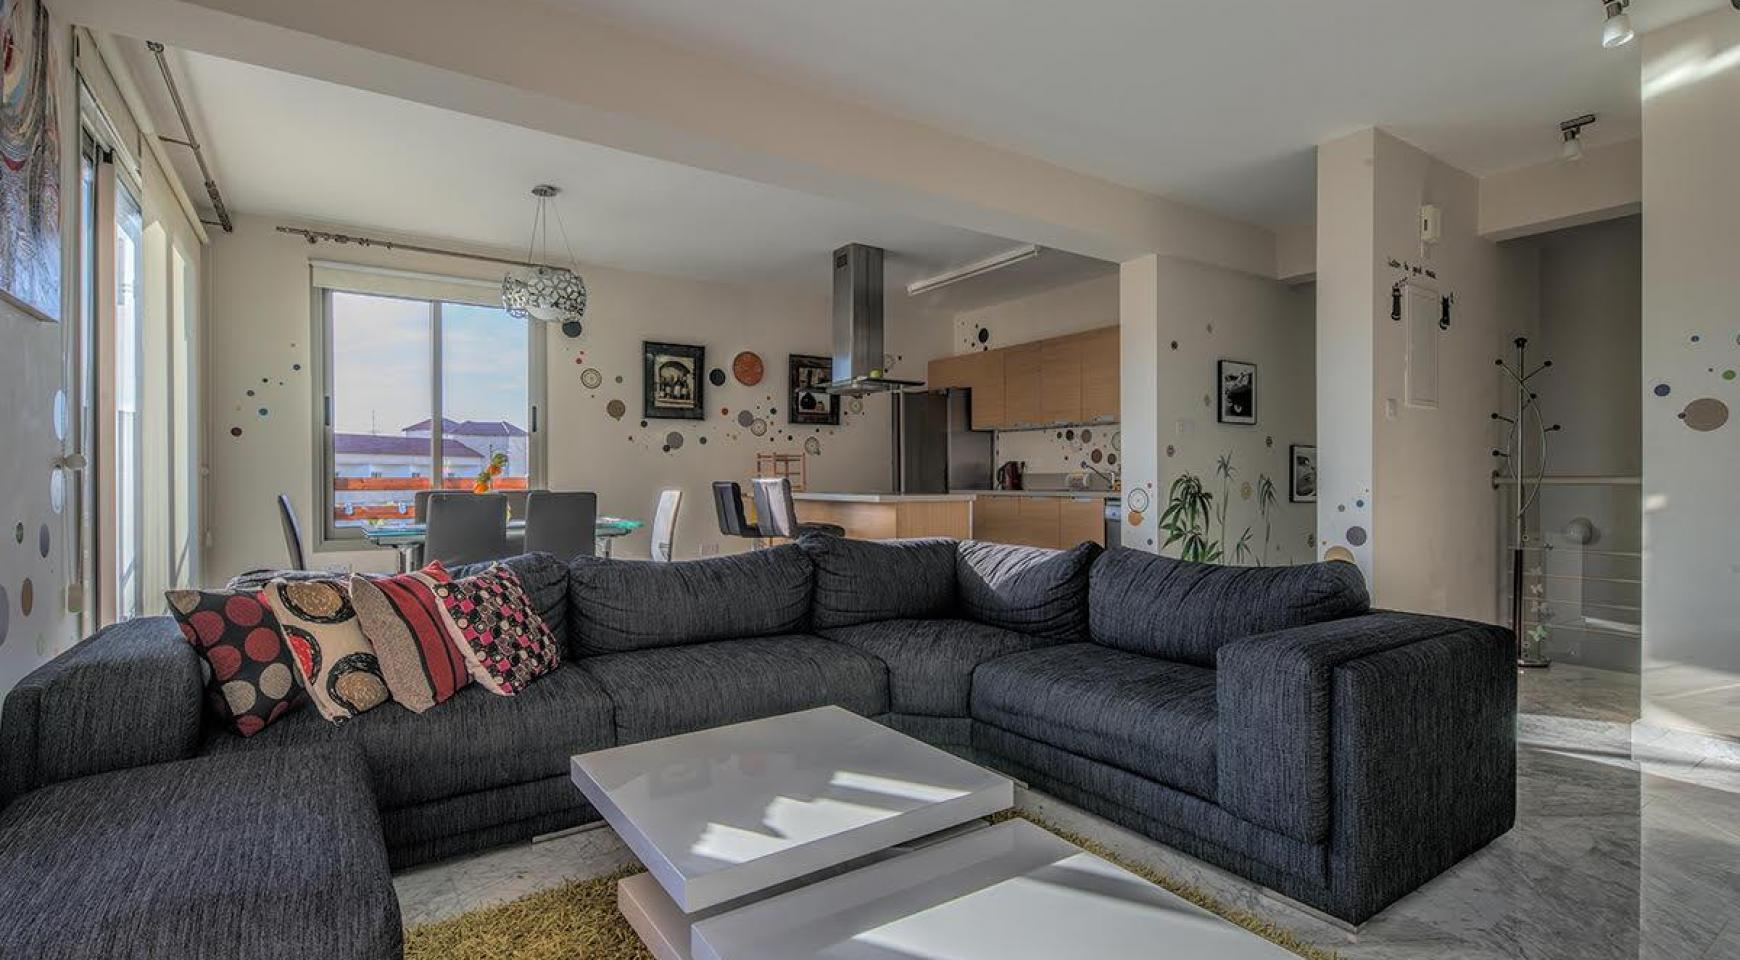 2 Bedroom Duplex Apartment Amathusa O 104 in a Prestigious Complex near the Sea  - 1